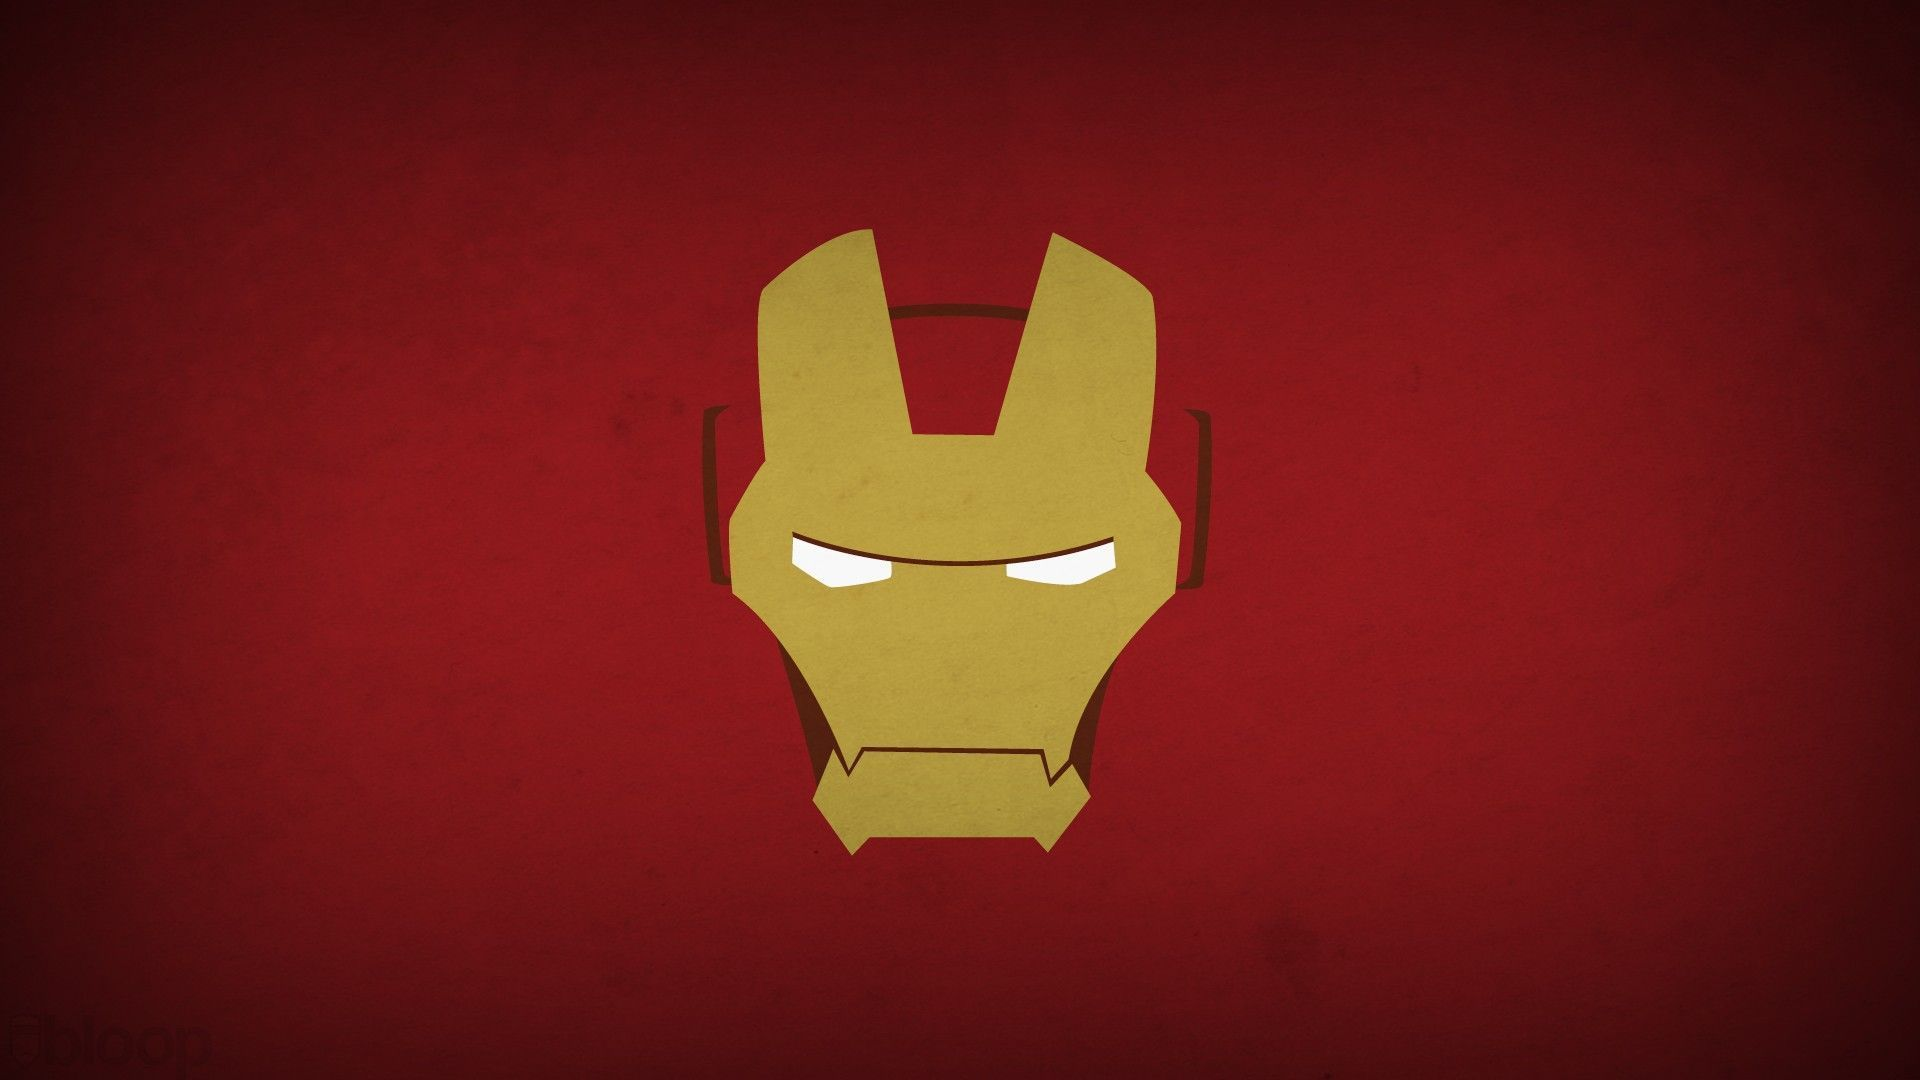 Marvel Superhero Logos Wallpapers.